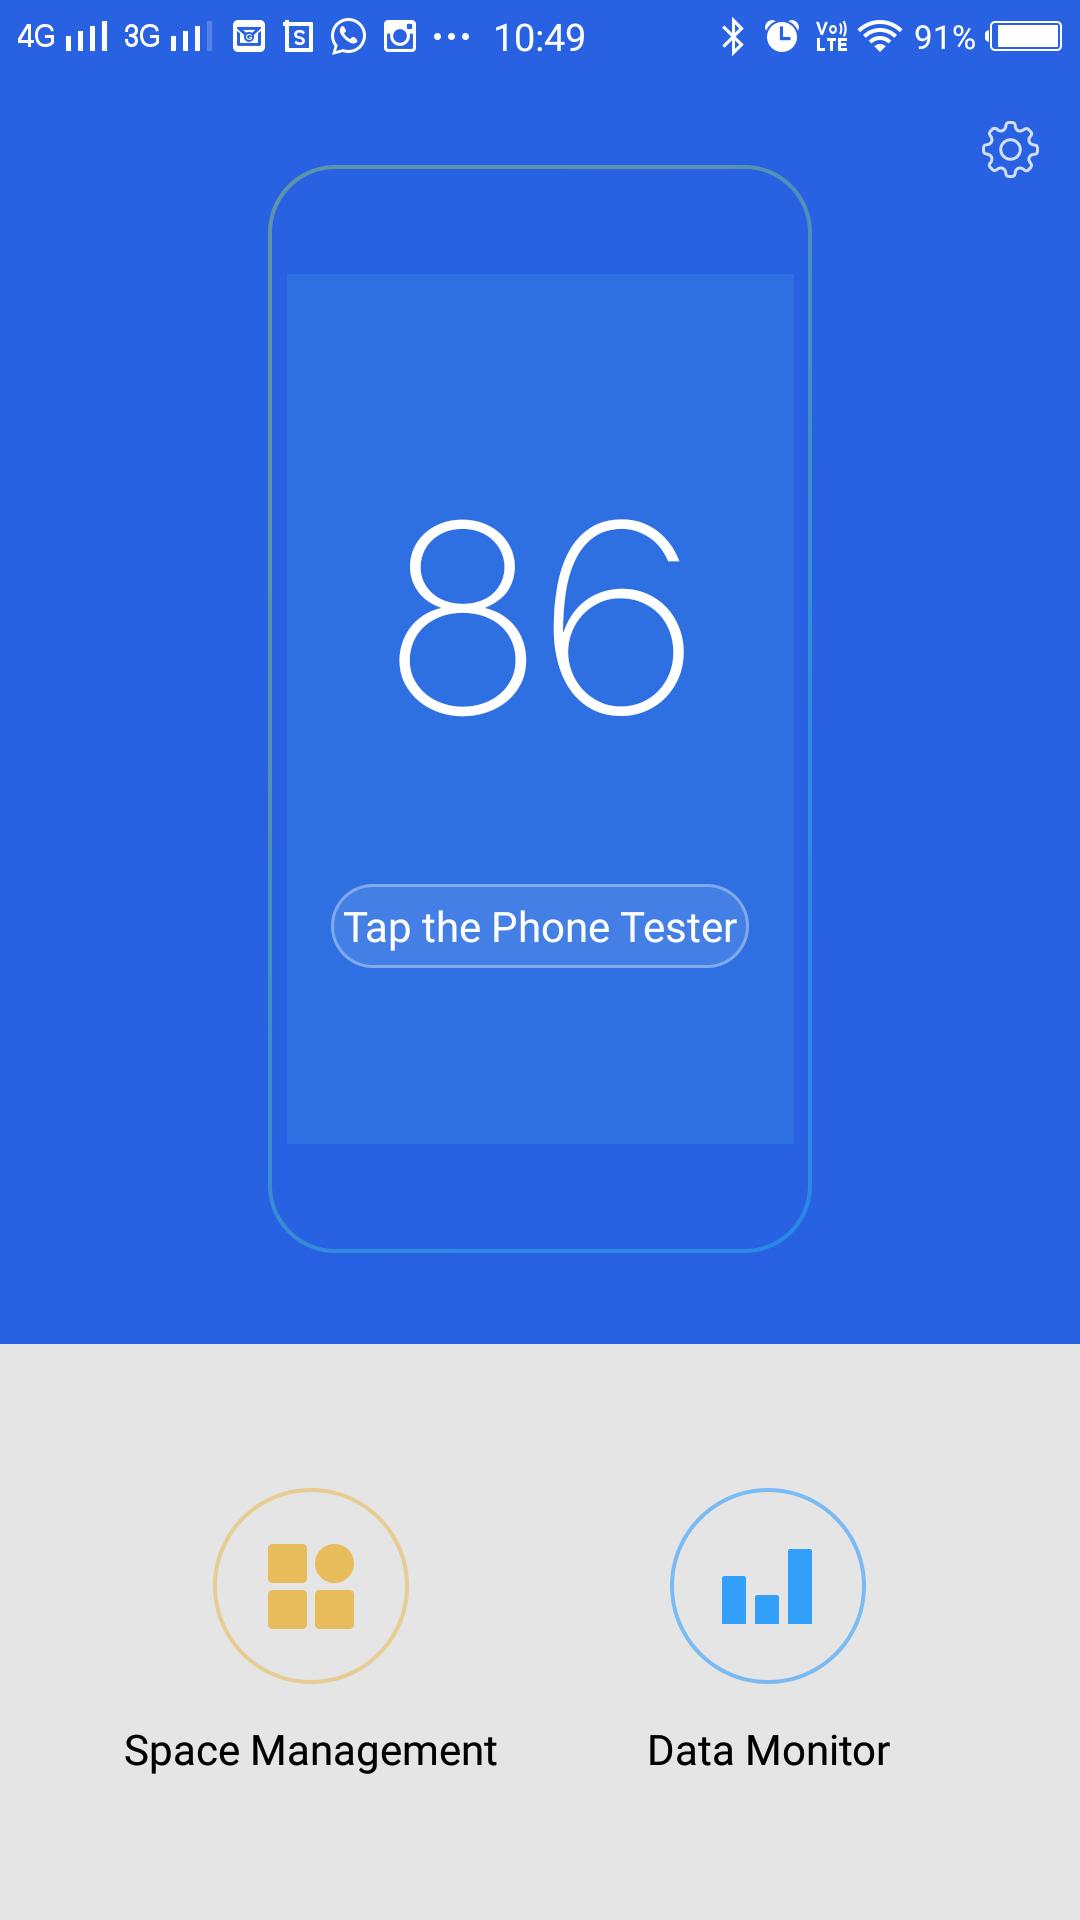 Vivo V5 Plus : How to change default application - GadgetDetail